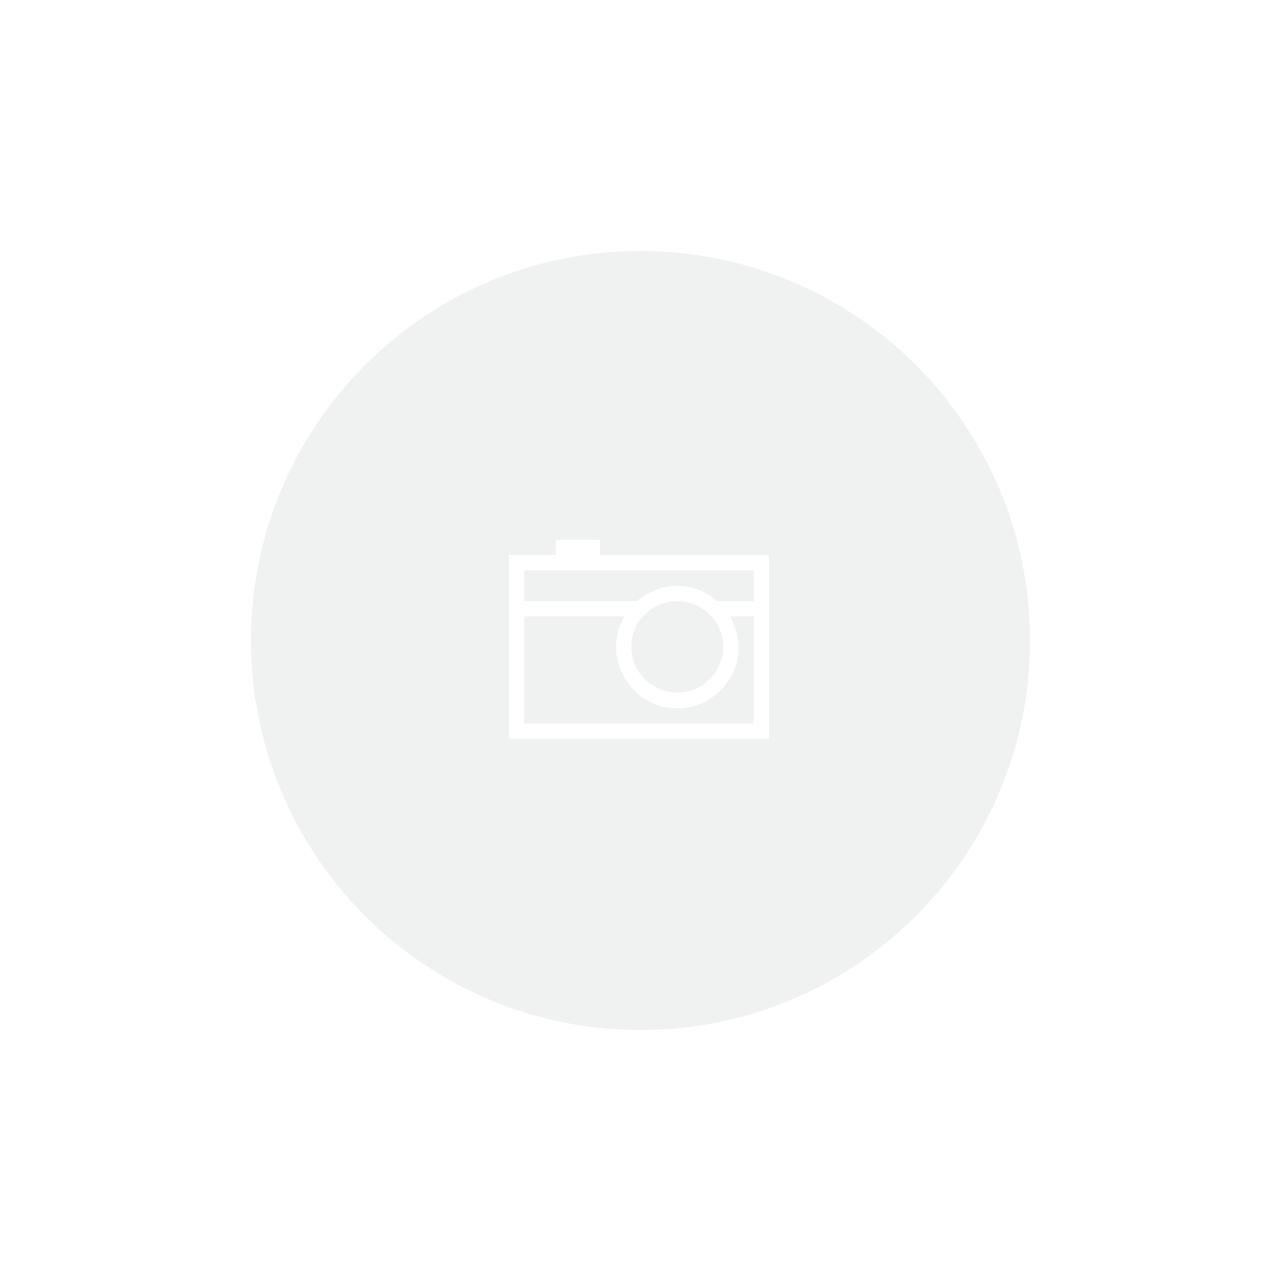 Almofada Branca 20x20cm (Capa + Enchimento)